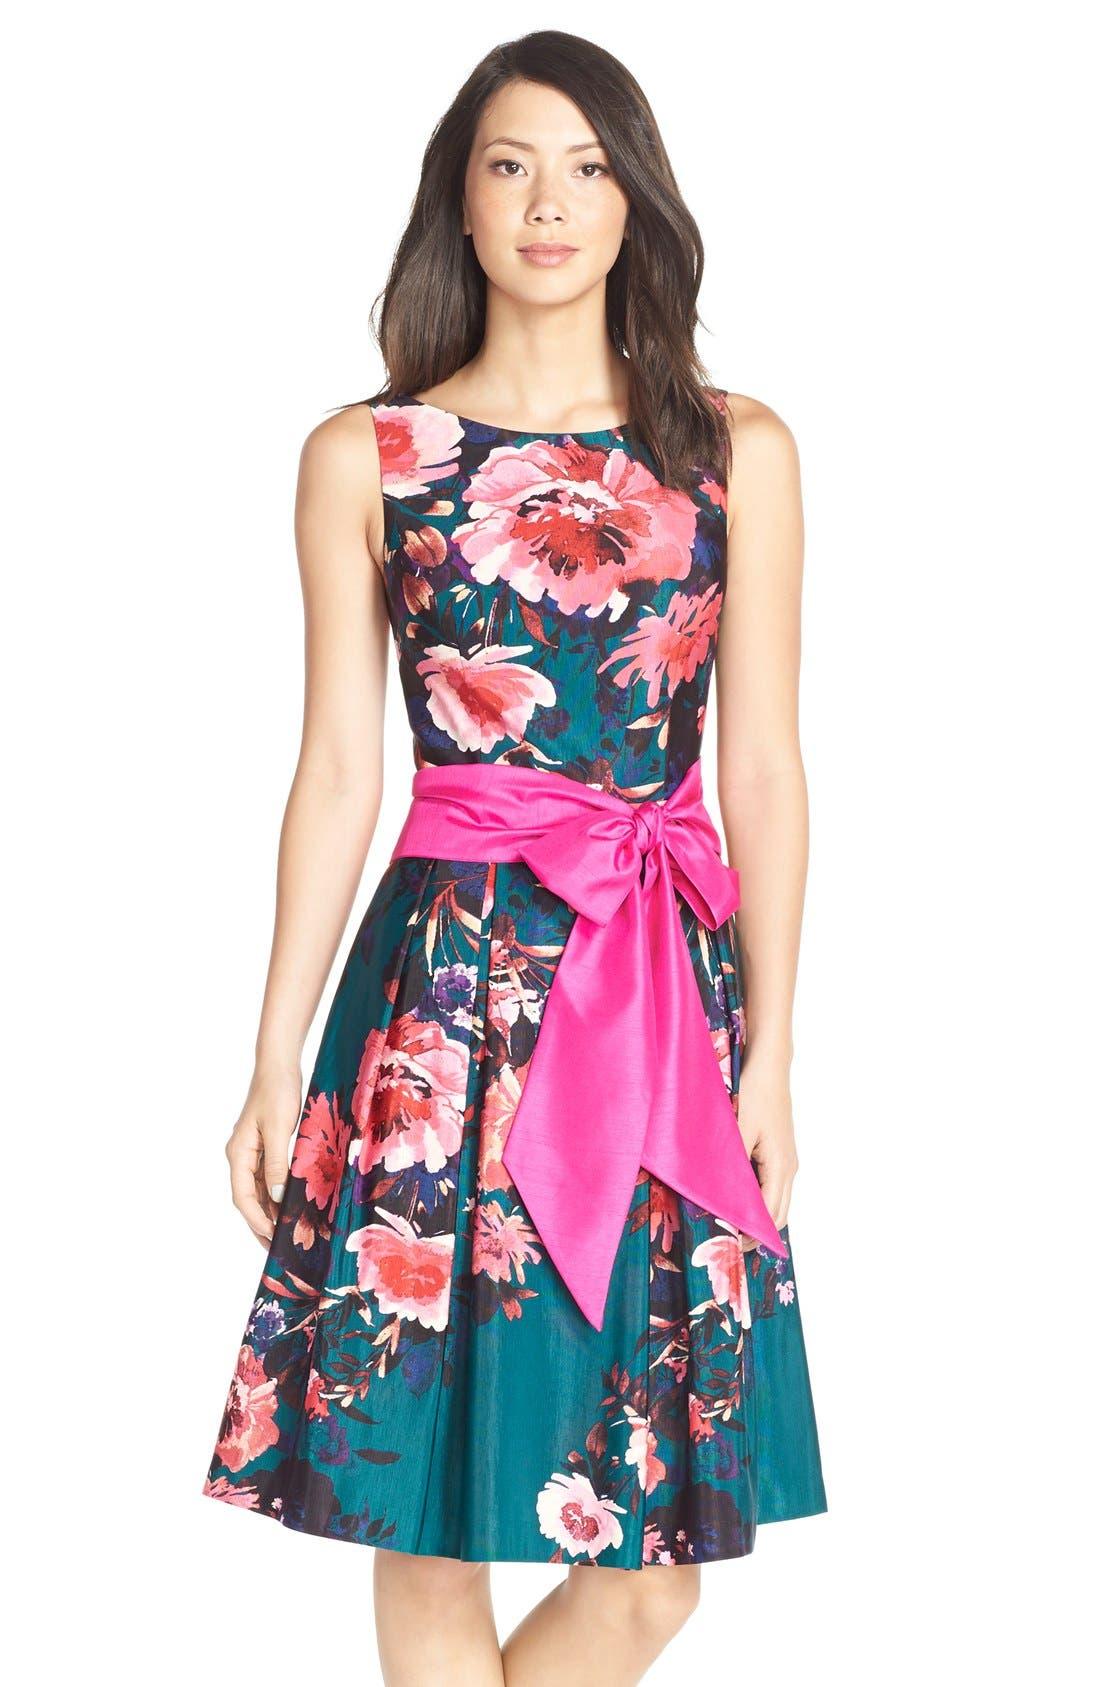 Alternate Image 1 Selected - Eliza JFloral Print Faille Fit & Flare Dress (Regular & Petite)